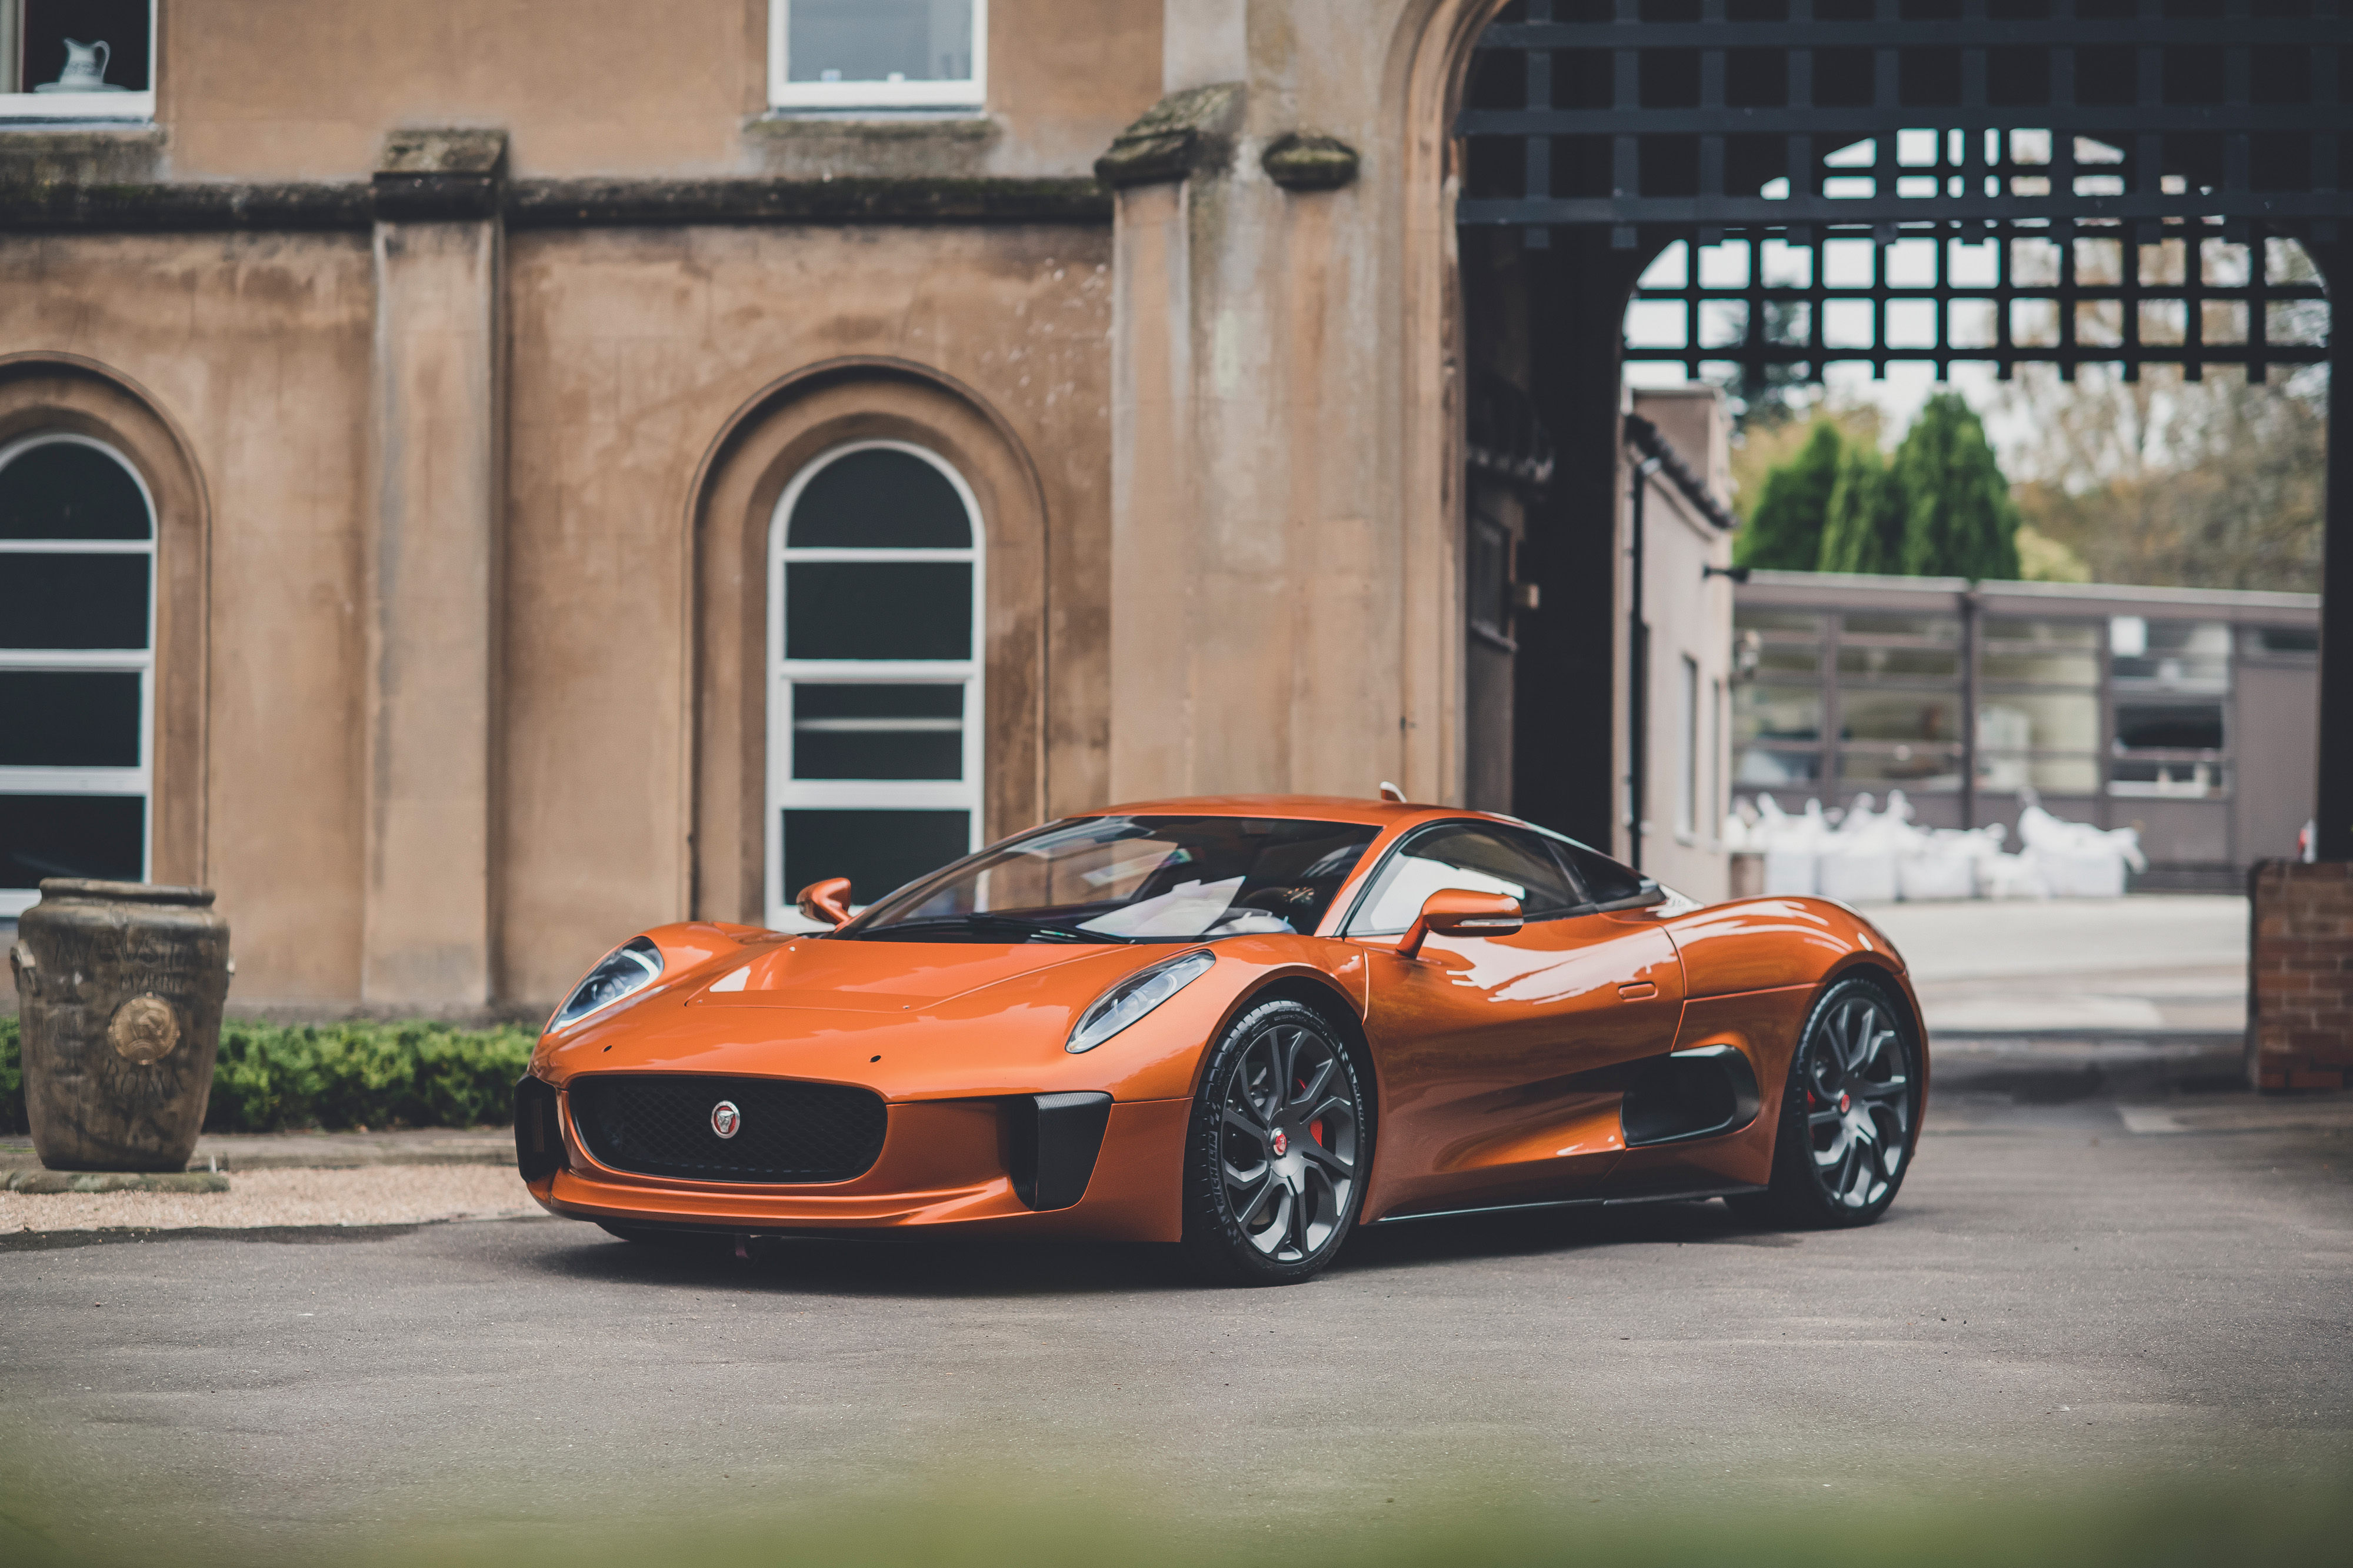 Jaguar CX75 Spectre orange stunt car